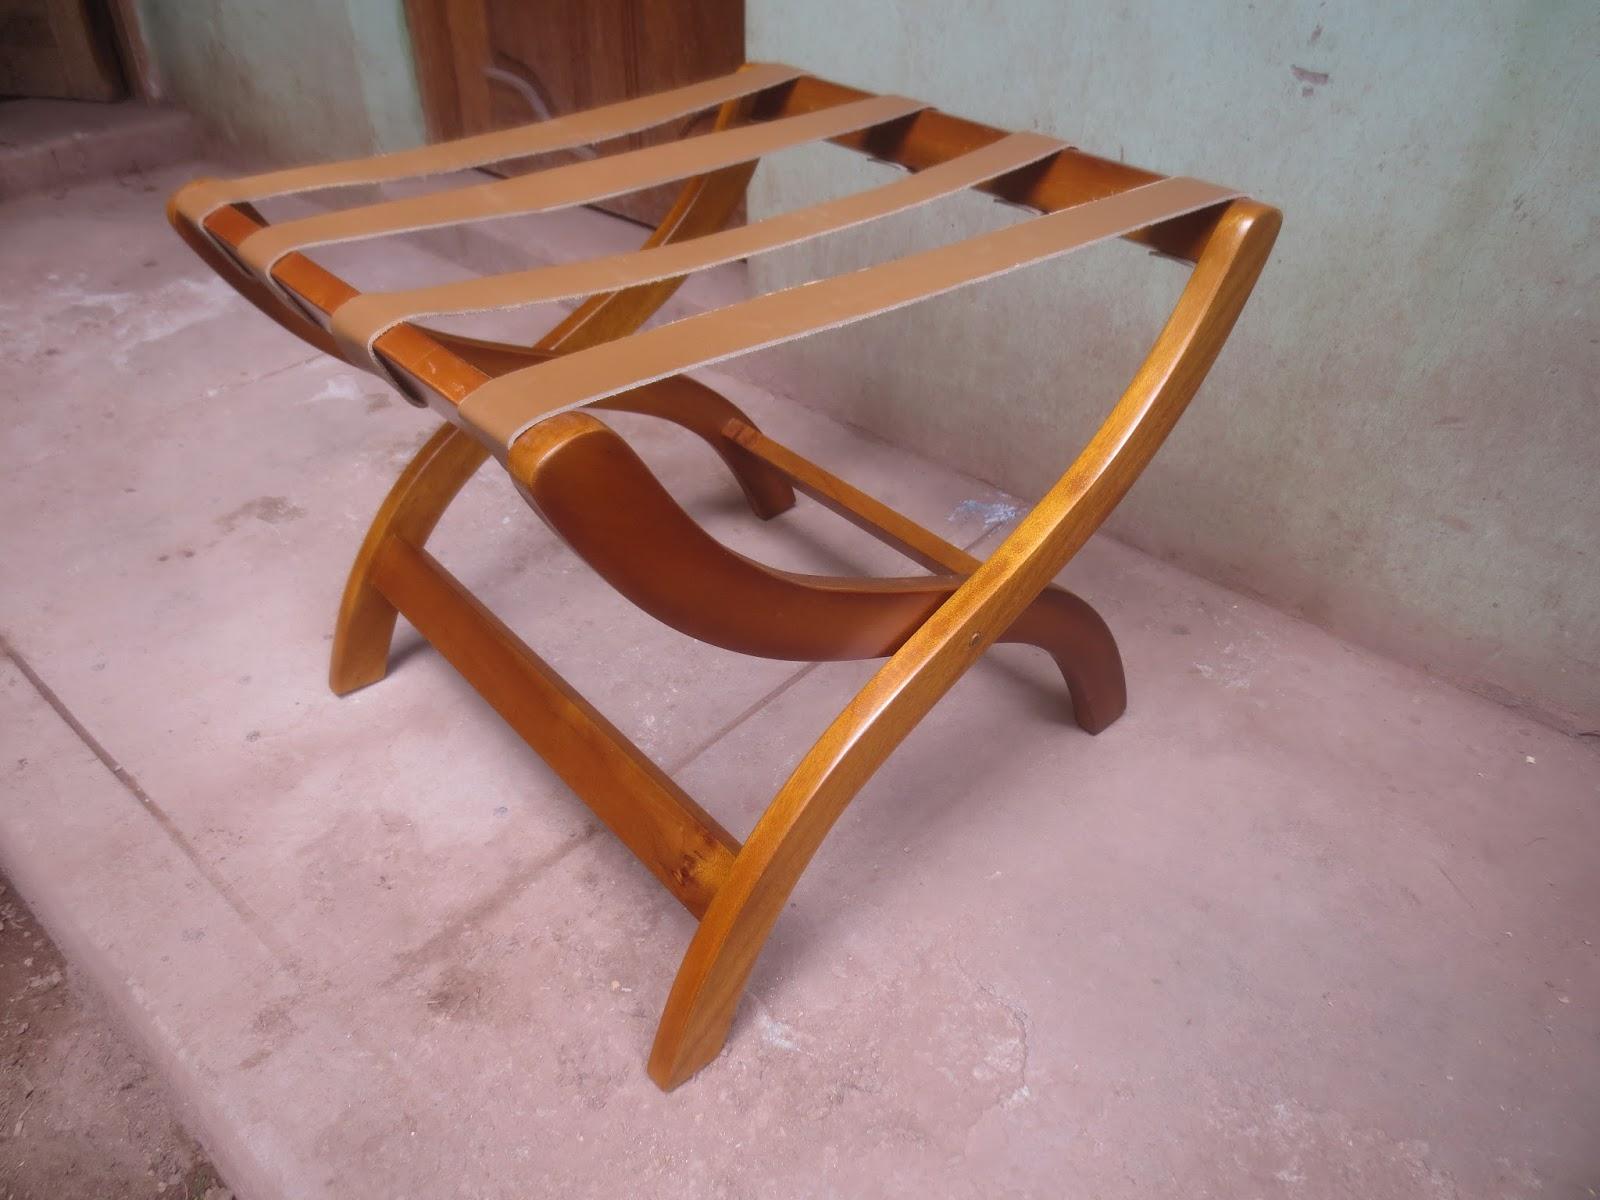 Decoraciones manualidades en madera - Manualidades con madera ...